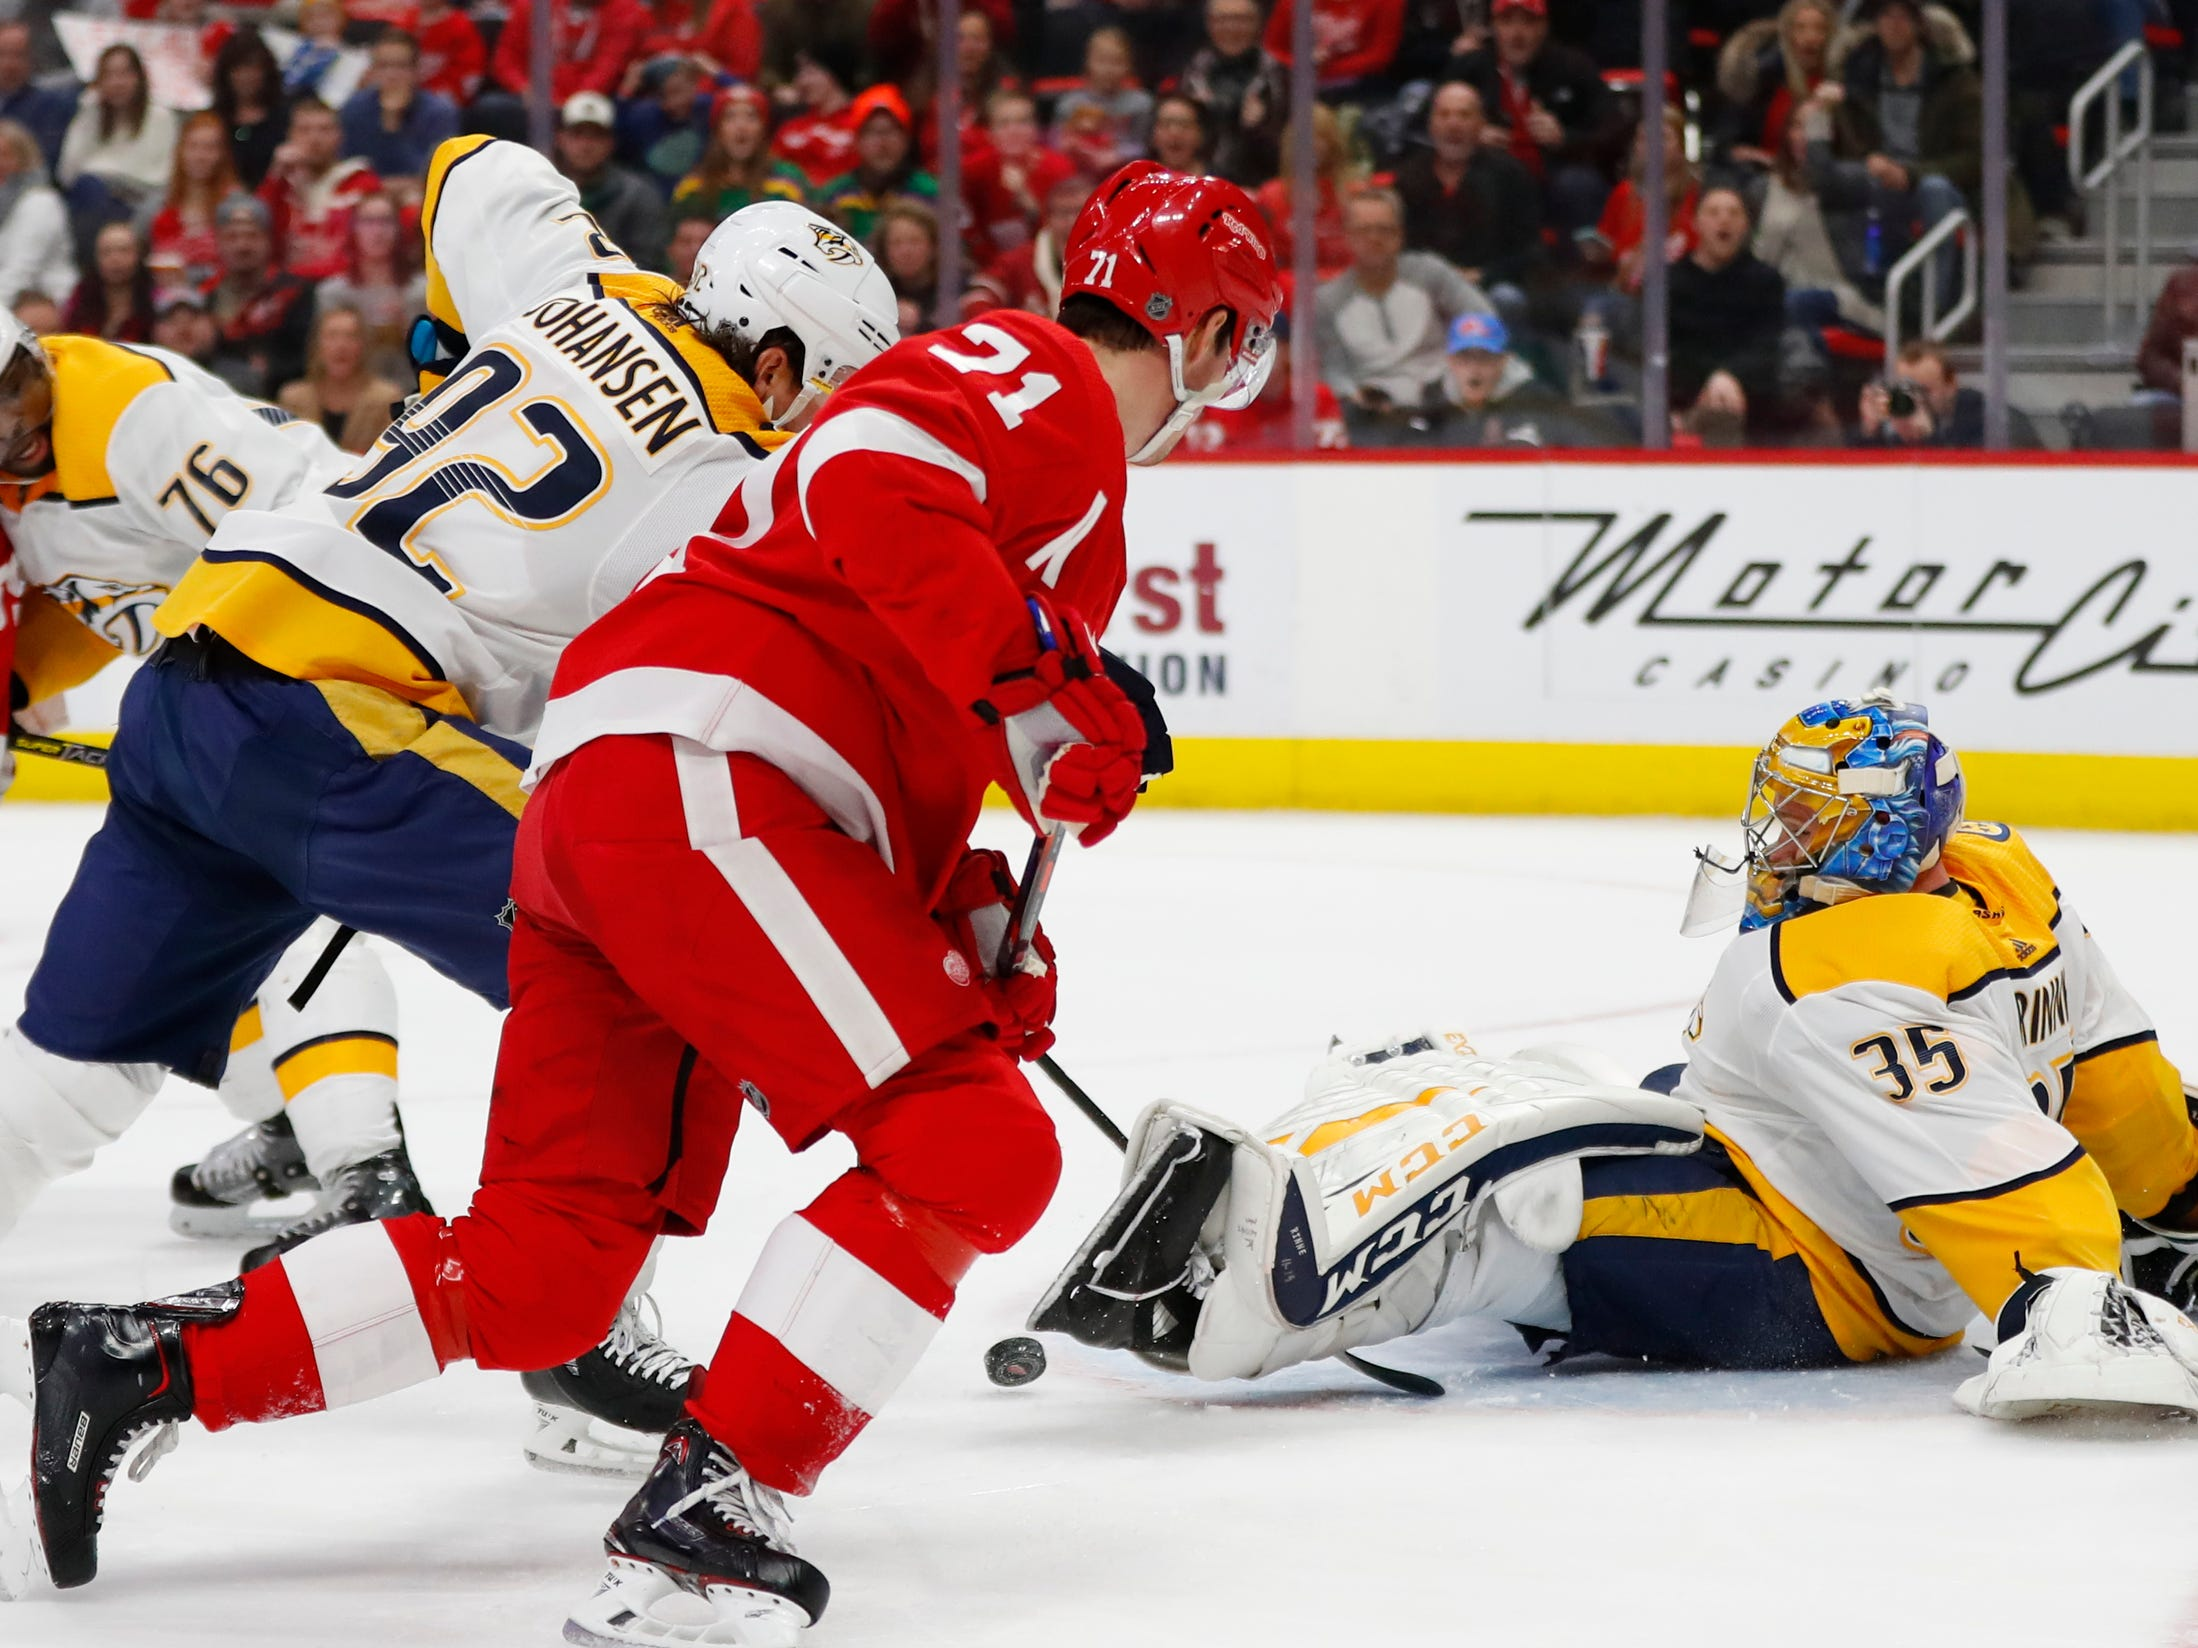 Nashville Predators goaltender Pekka Rinne (35) stops a Detroit Red Wings shot in the first period.